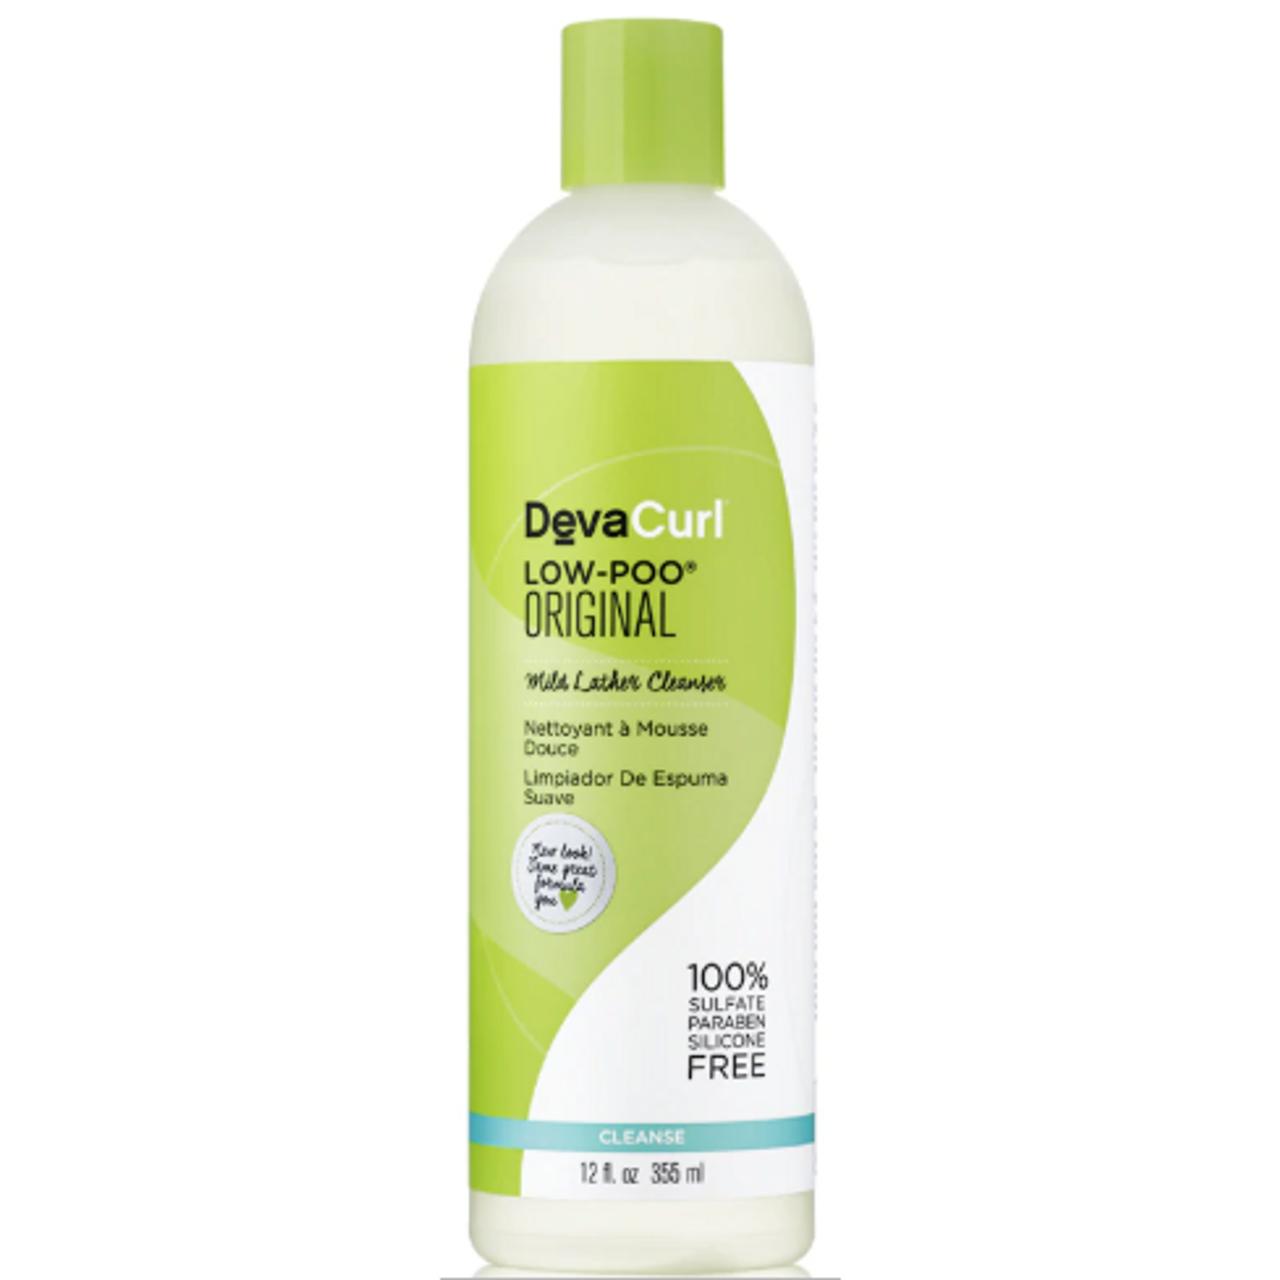 DevaCurl Low-Poo - 12 OZ